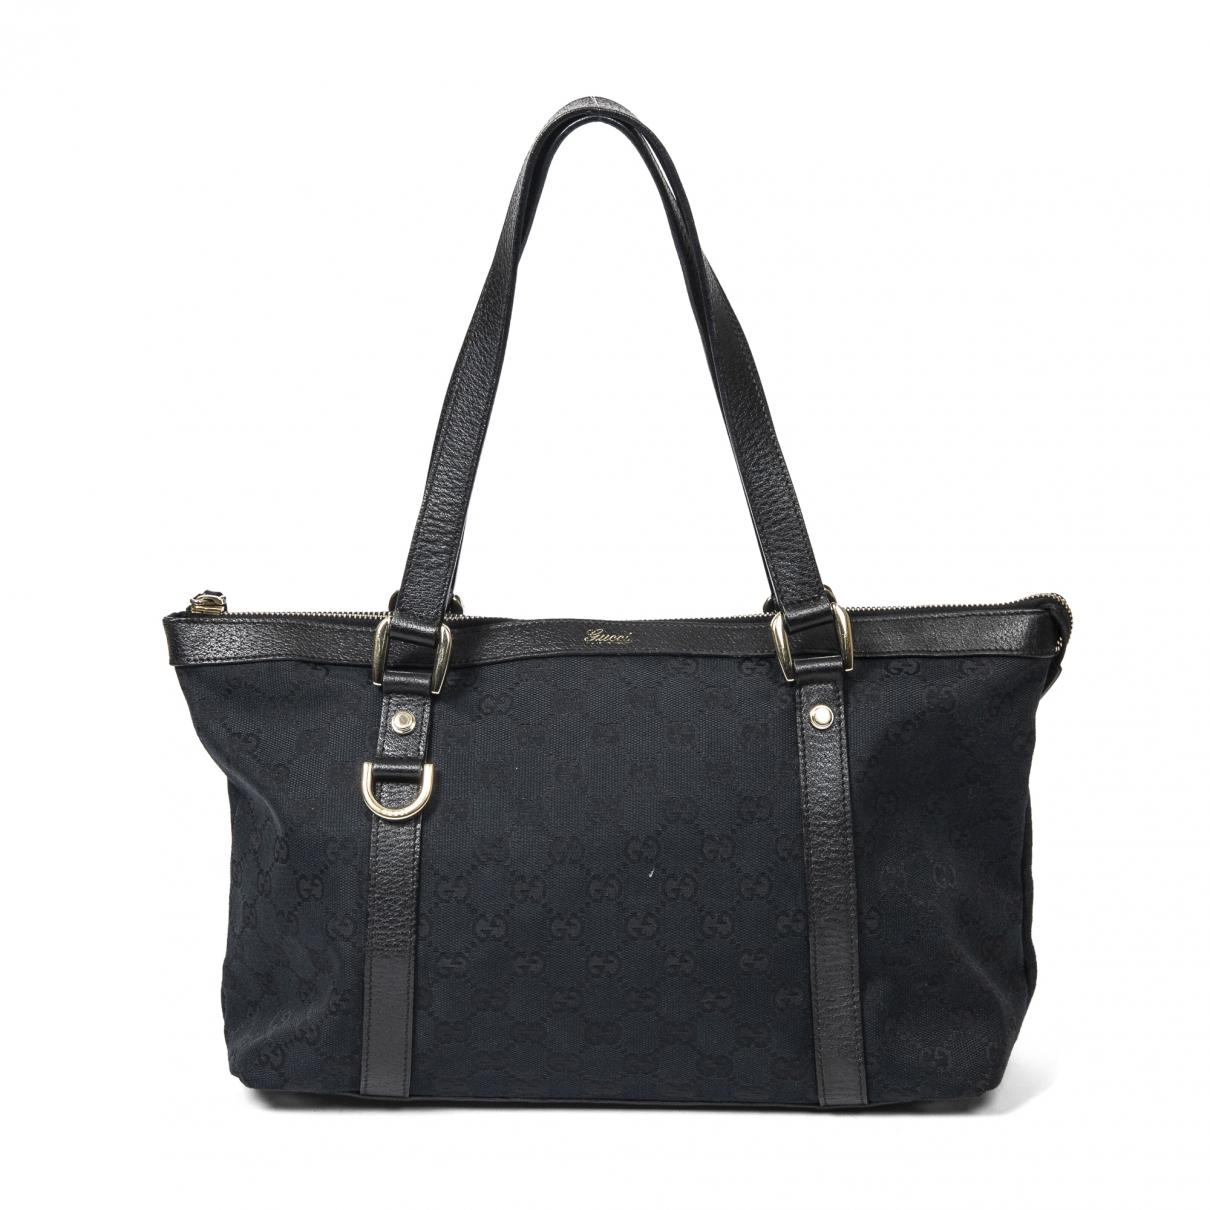 Gucci \N Black Cotton handbag for Women \N